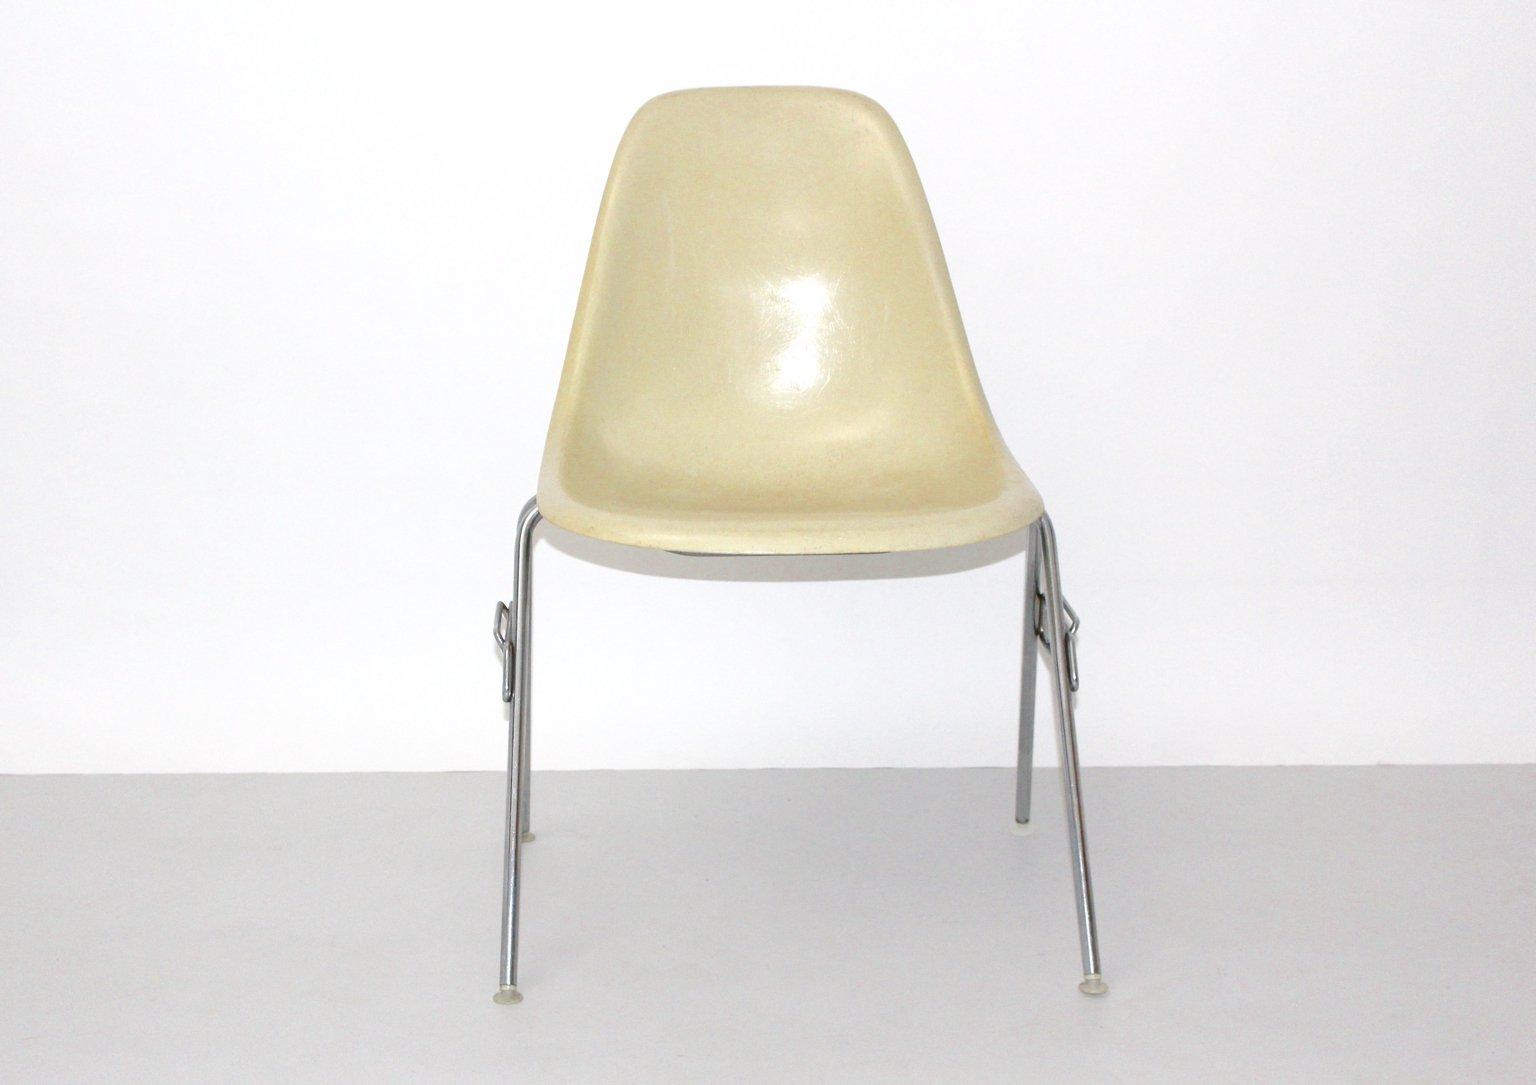 Stuhl charles eames vitra stuhl armlehne eames daw for Ea 119 nachbau